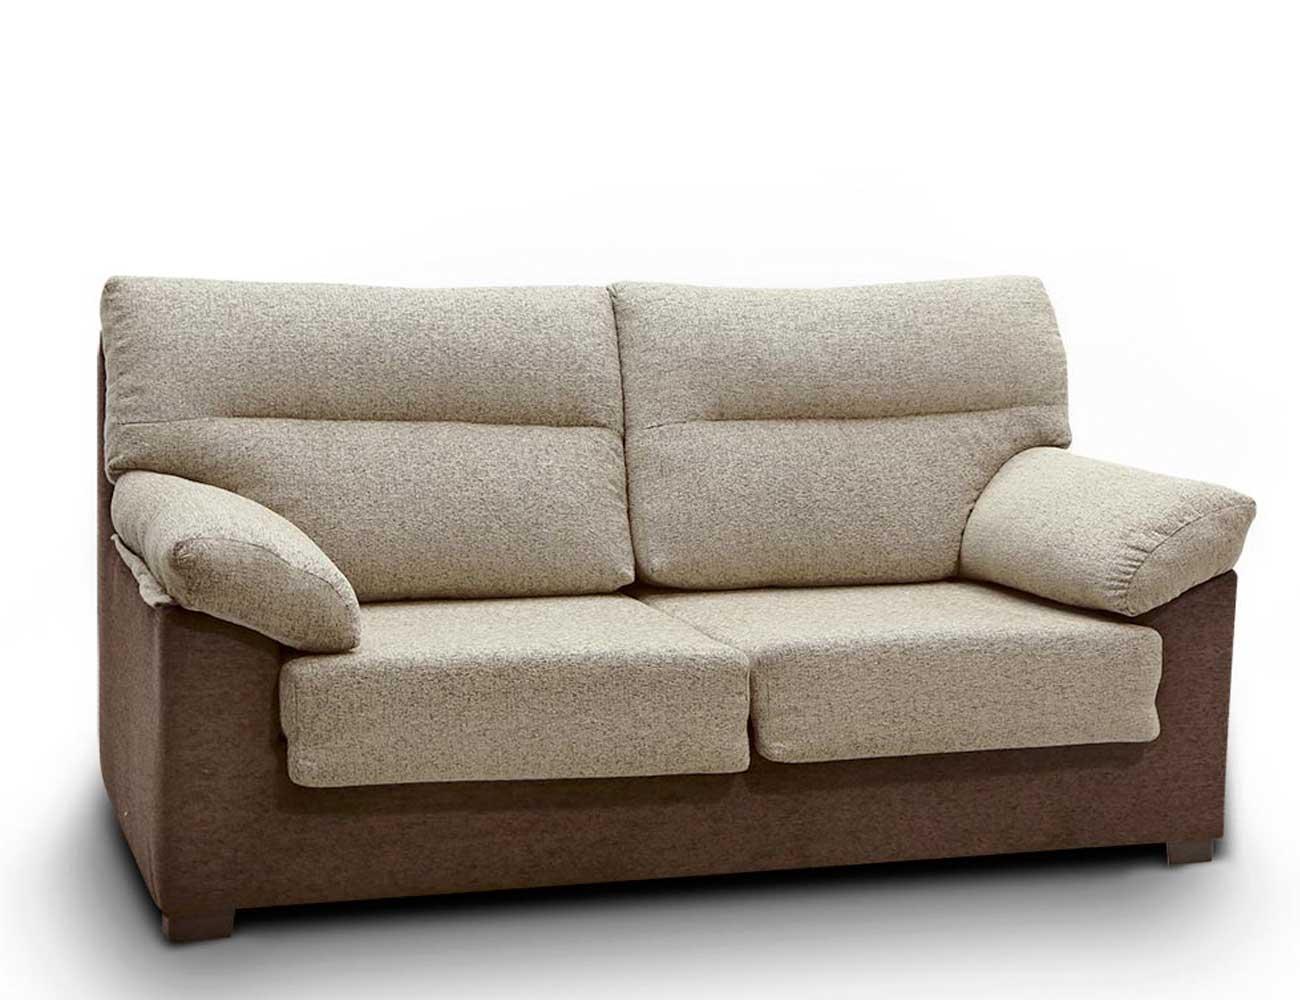 Sofa 3 plazas barato4